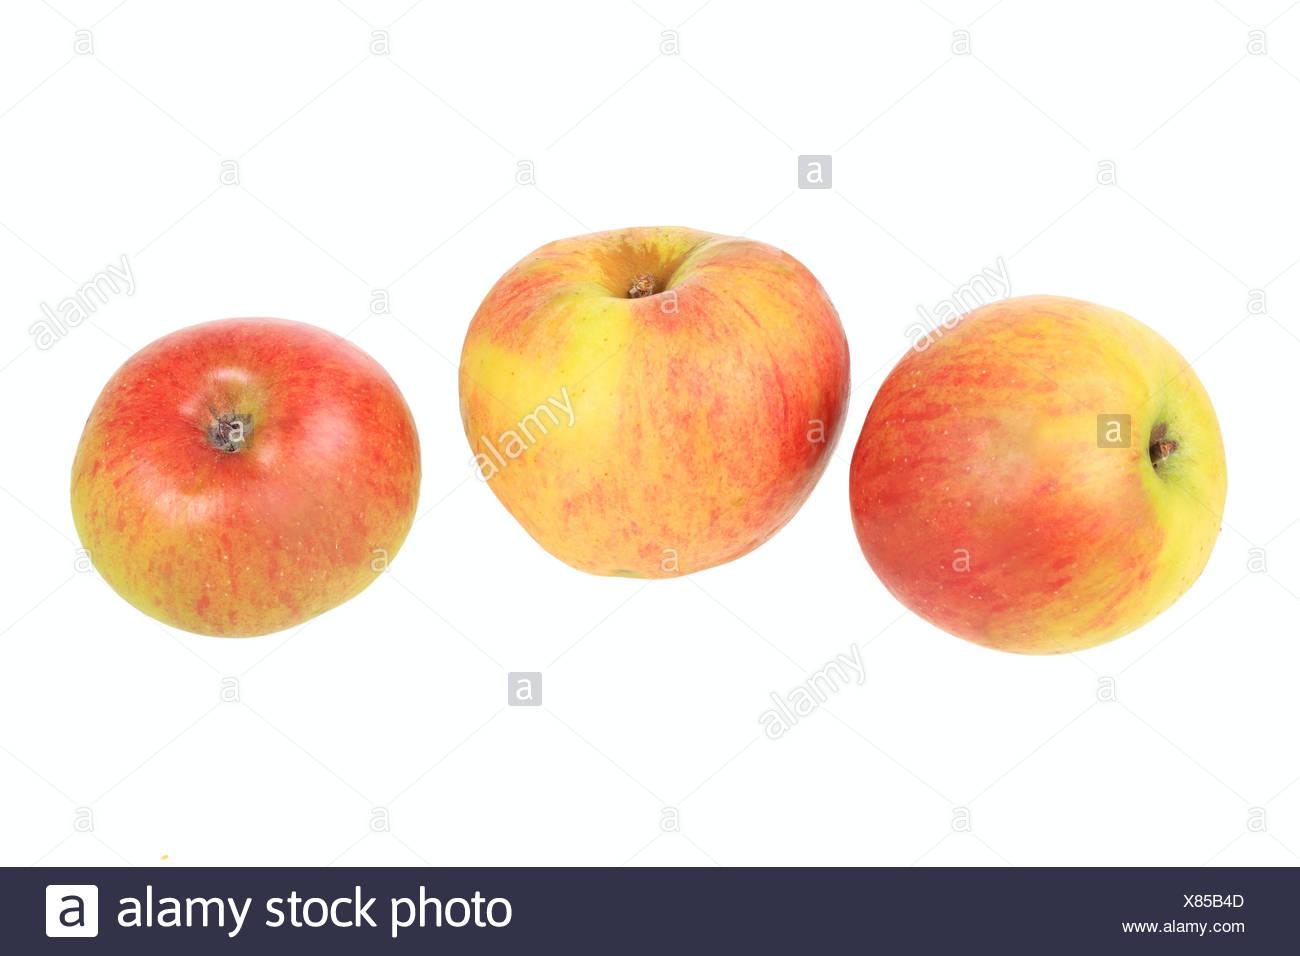 Apples, Rheinische Schafsnase variety, traditional sort for producing cider Stock Photo